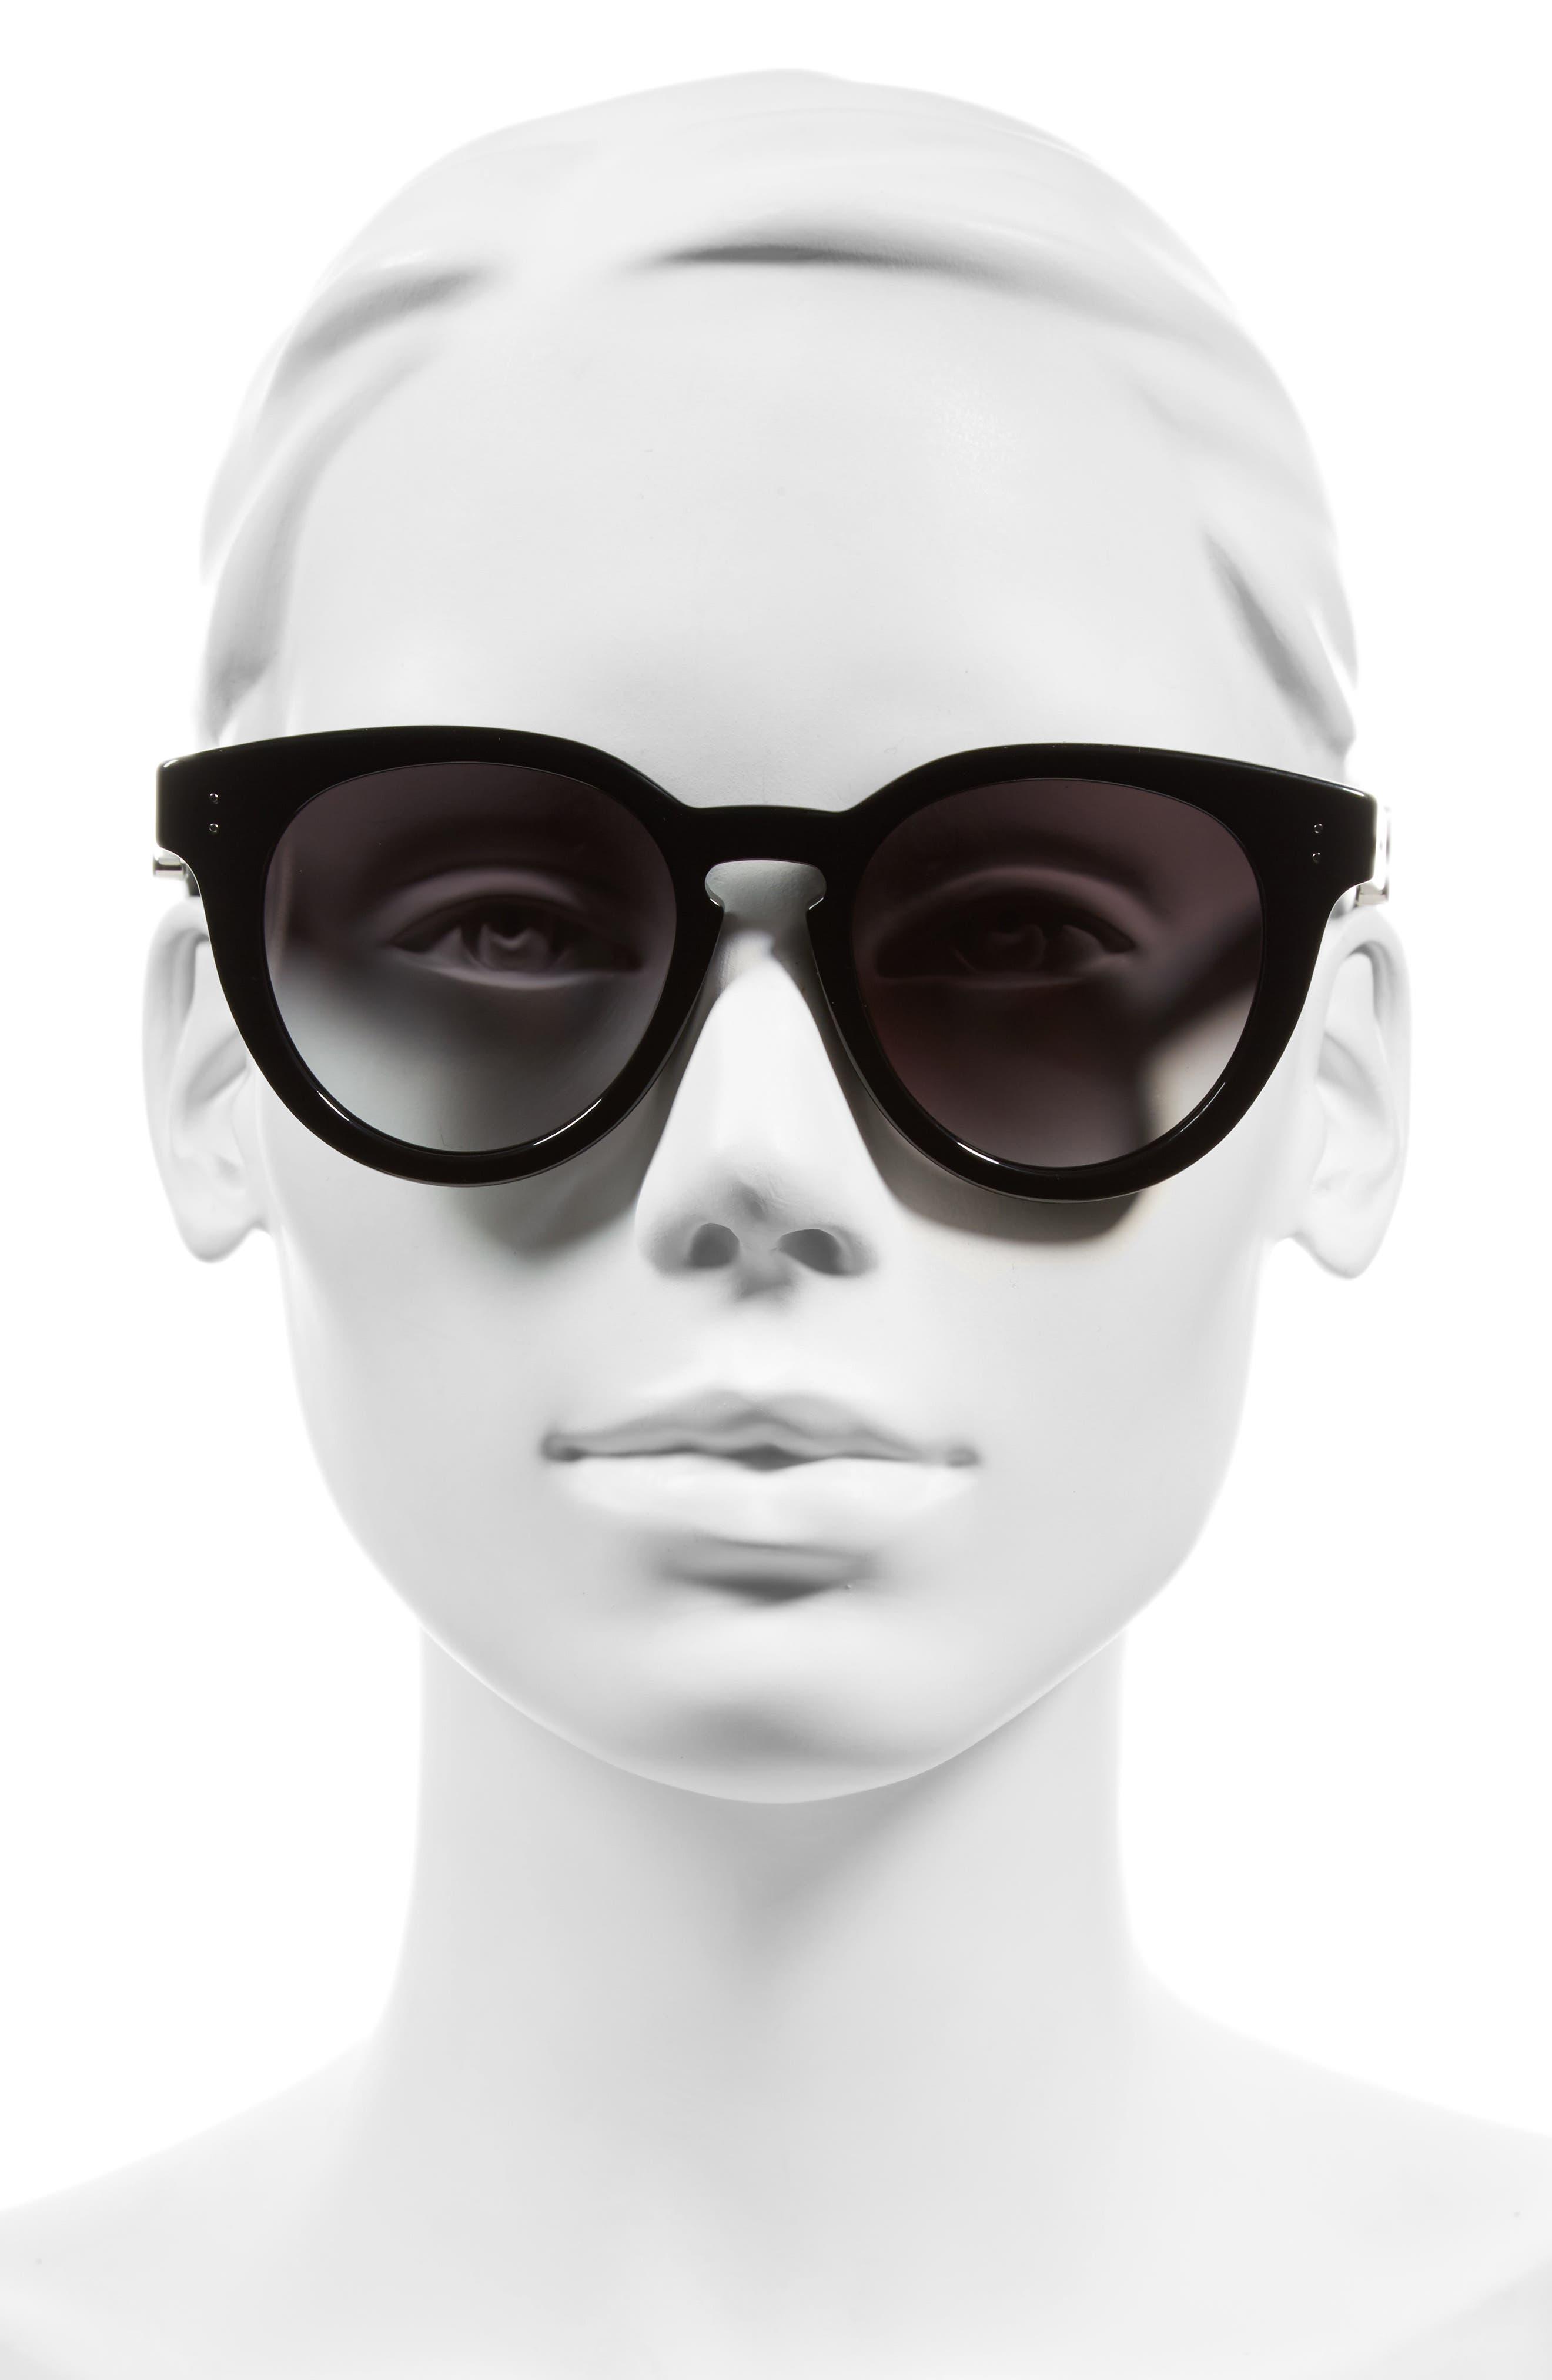 50mm Round Sunglasses,                             Alternate thumbnail 3, color,                             001